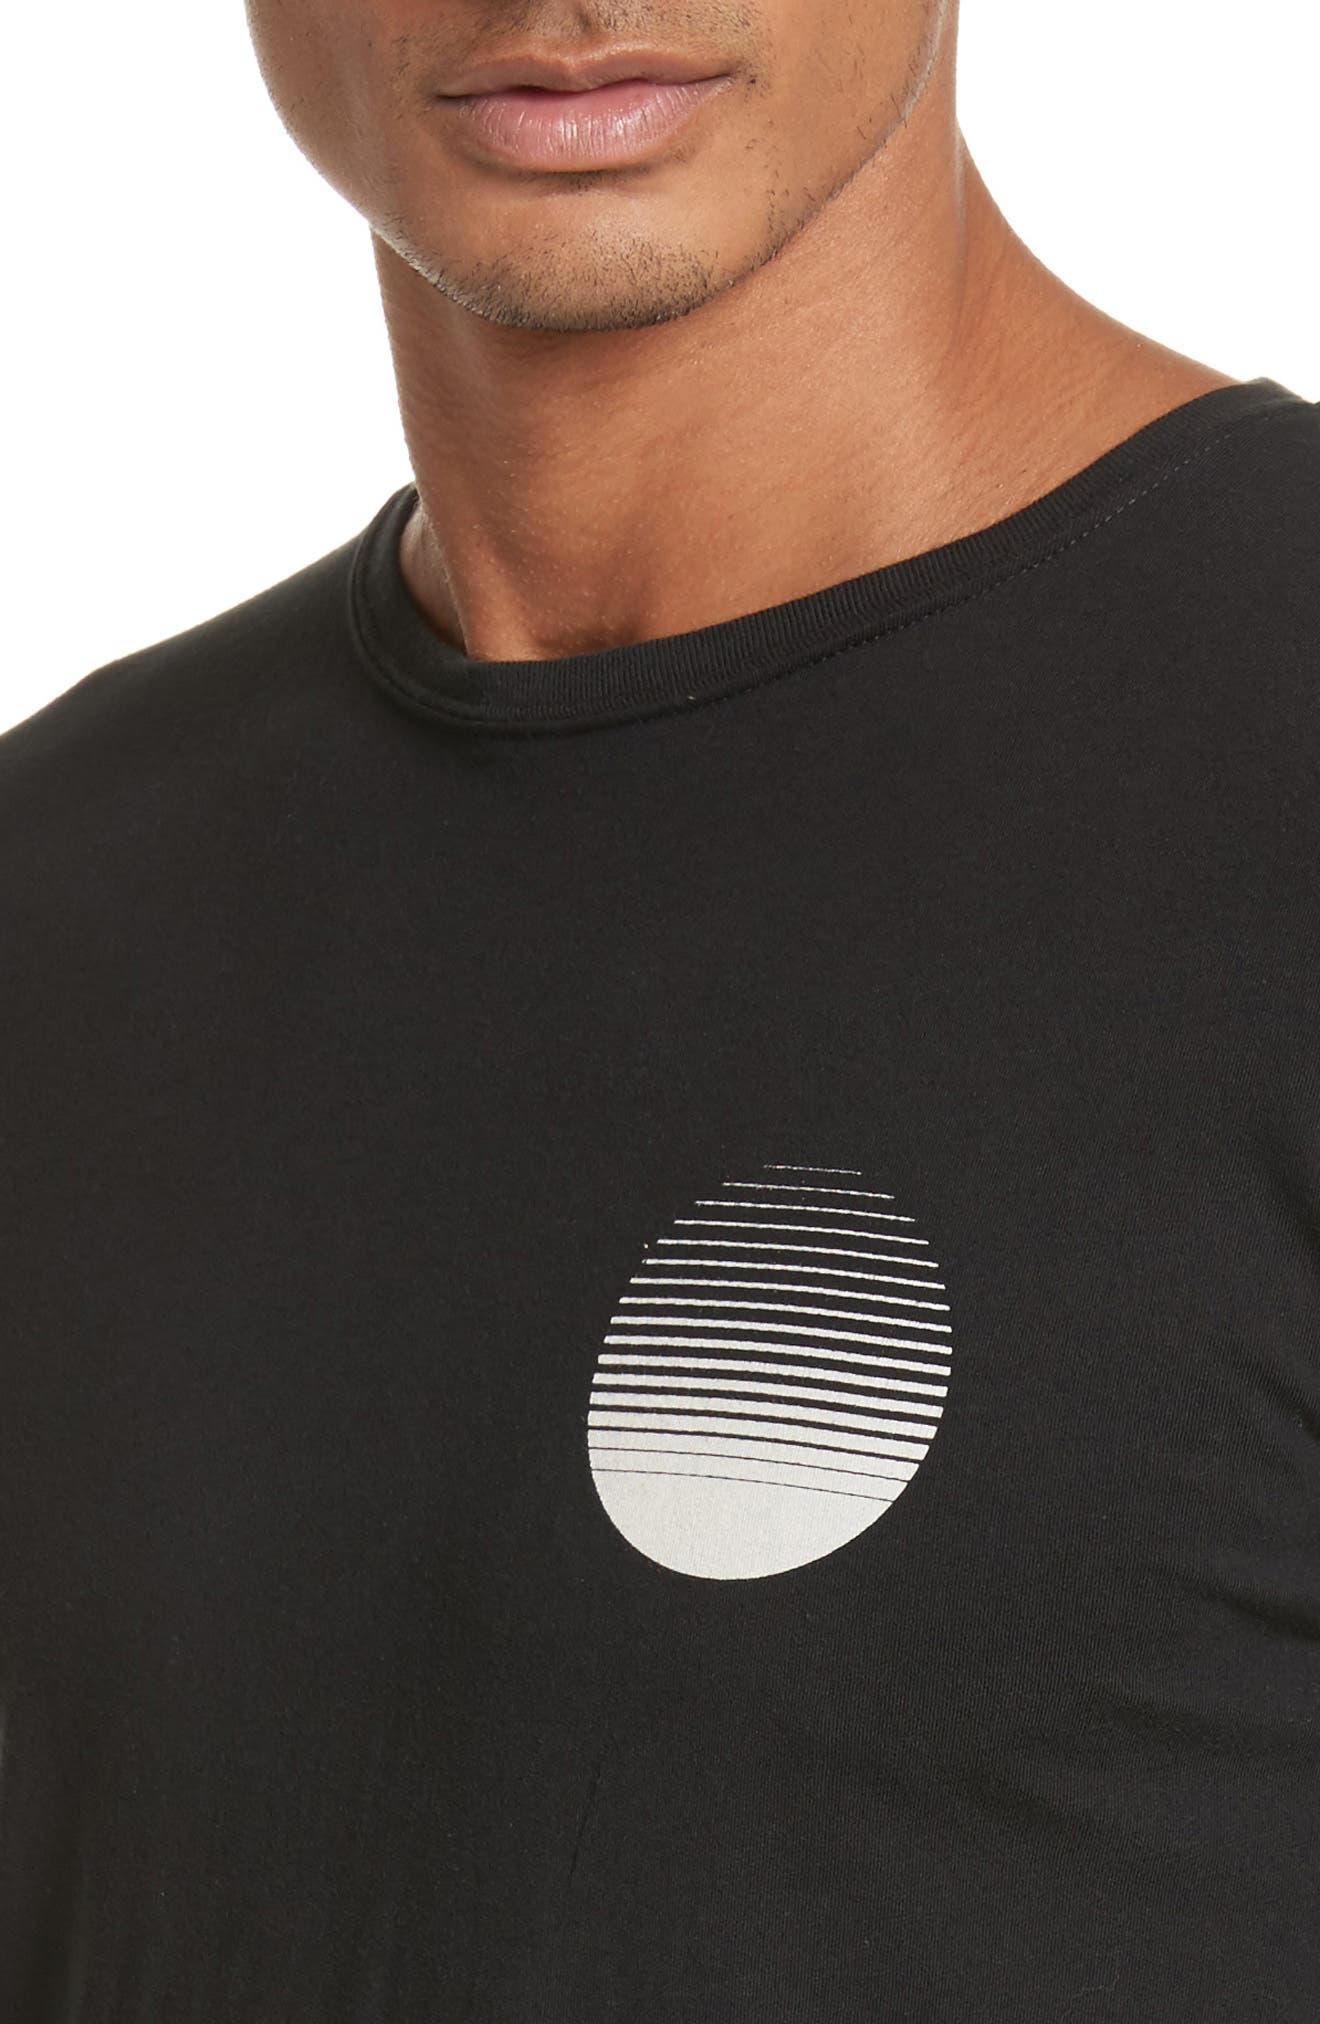 Sunset Graphic Long Sleeve T-Shirt,                             Alternate thumbnail 4, color,                             001